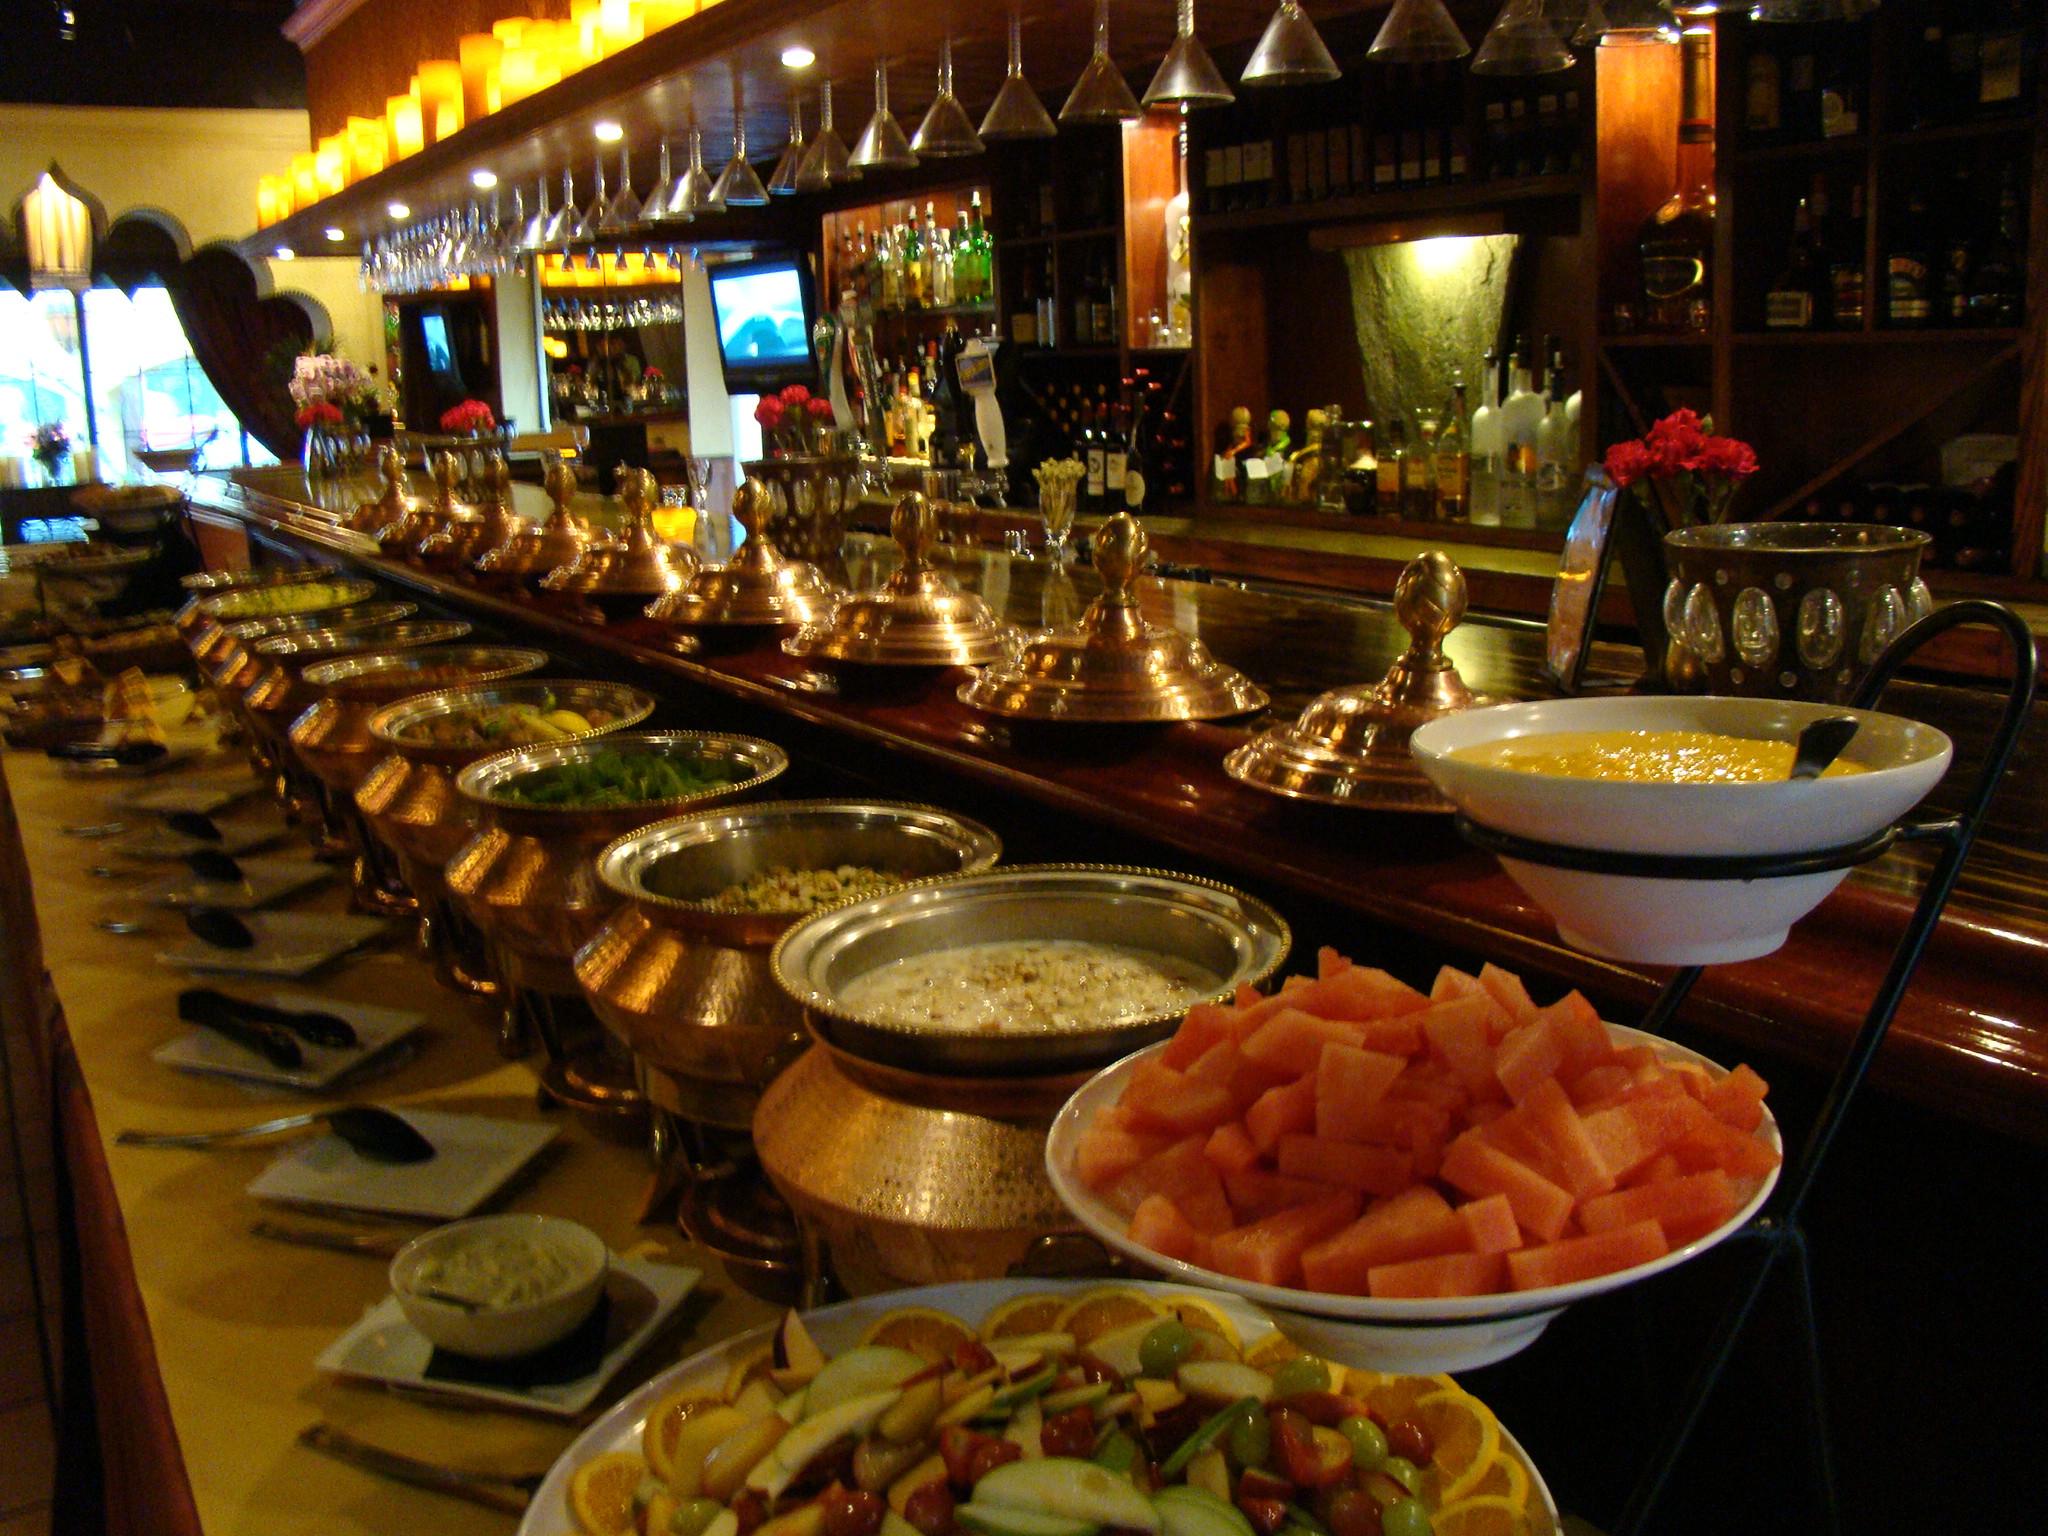 Easter Dinner At Restaurants  GoingOut India Restaurant Event Easter Buffet Brunch